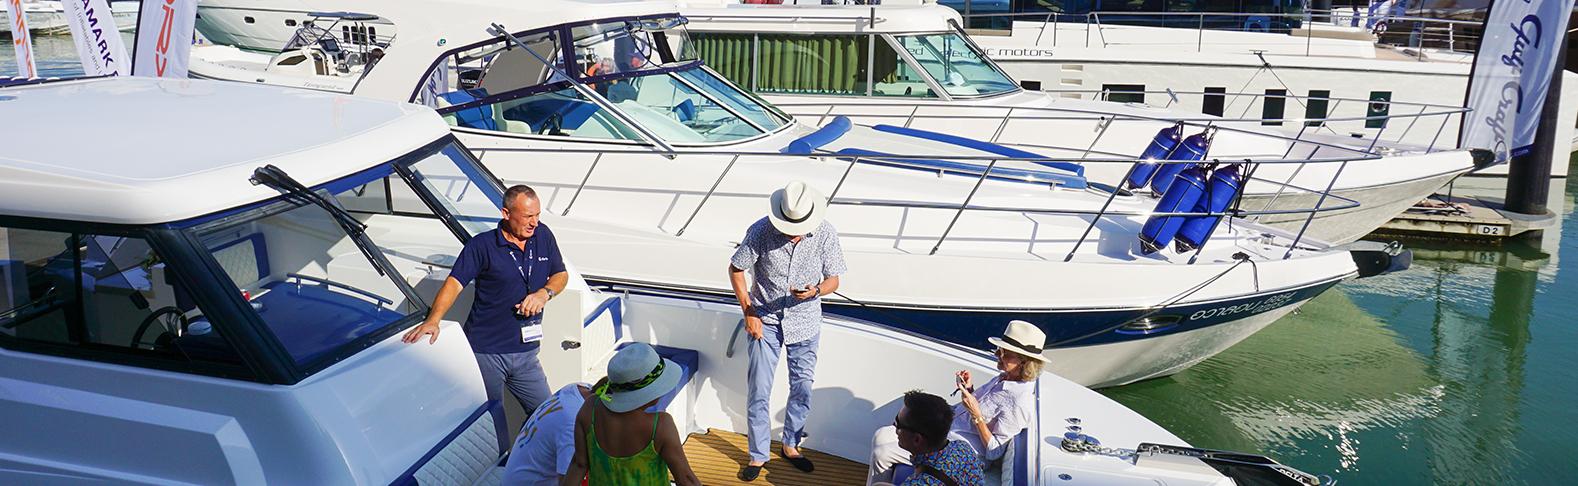 Gulf-Craft,-Thailand-Yacht-Show-&-Rendezvous-2019